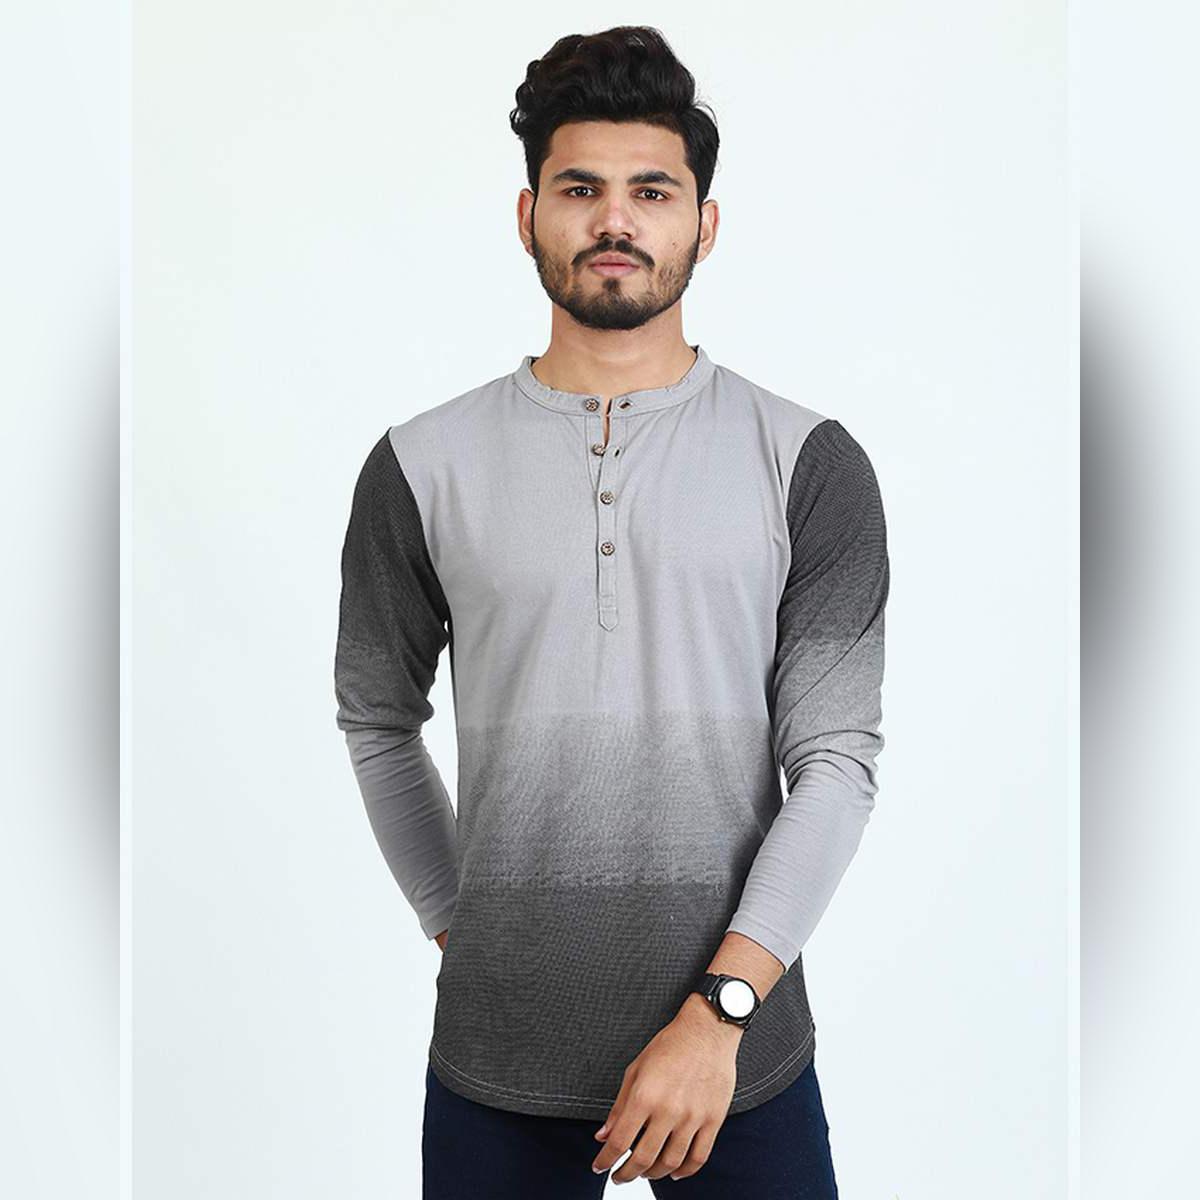 Long Sleeves Henly Printed Tshirt For Men